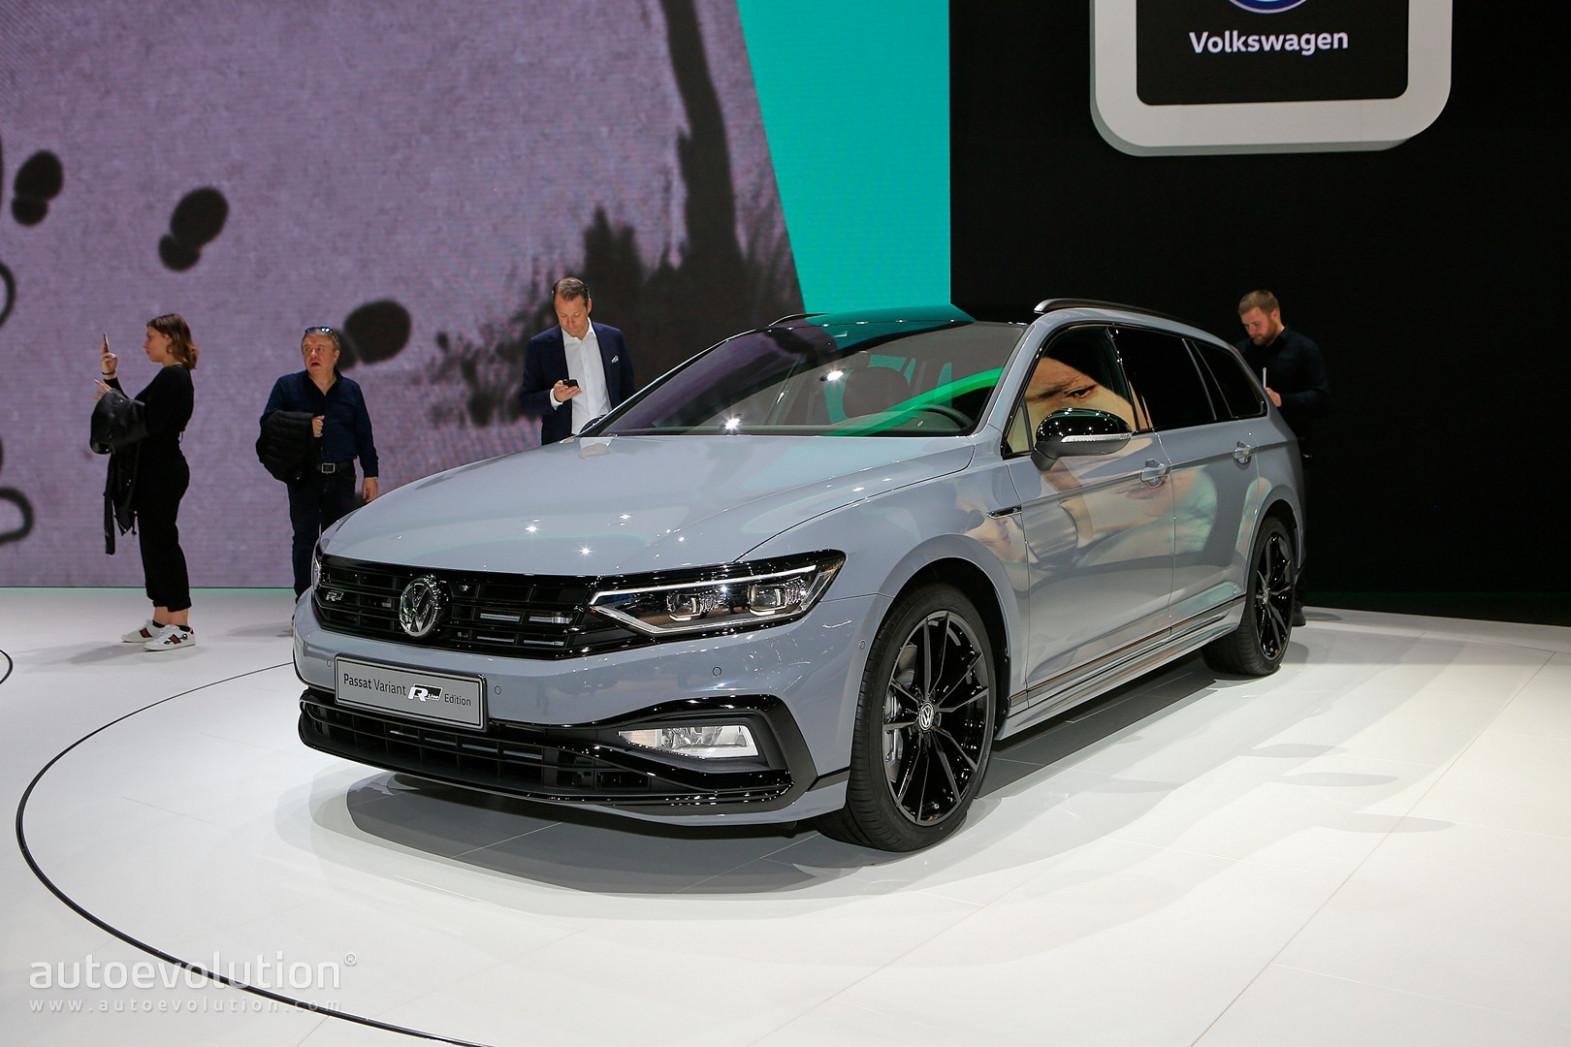 Spesification 2022 Volkswagen Passat Interior